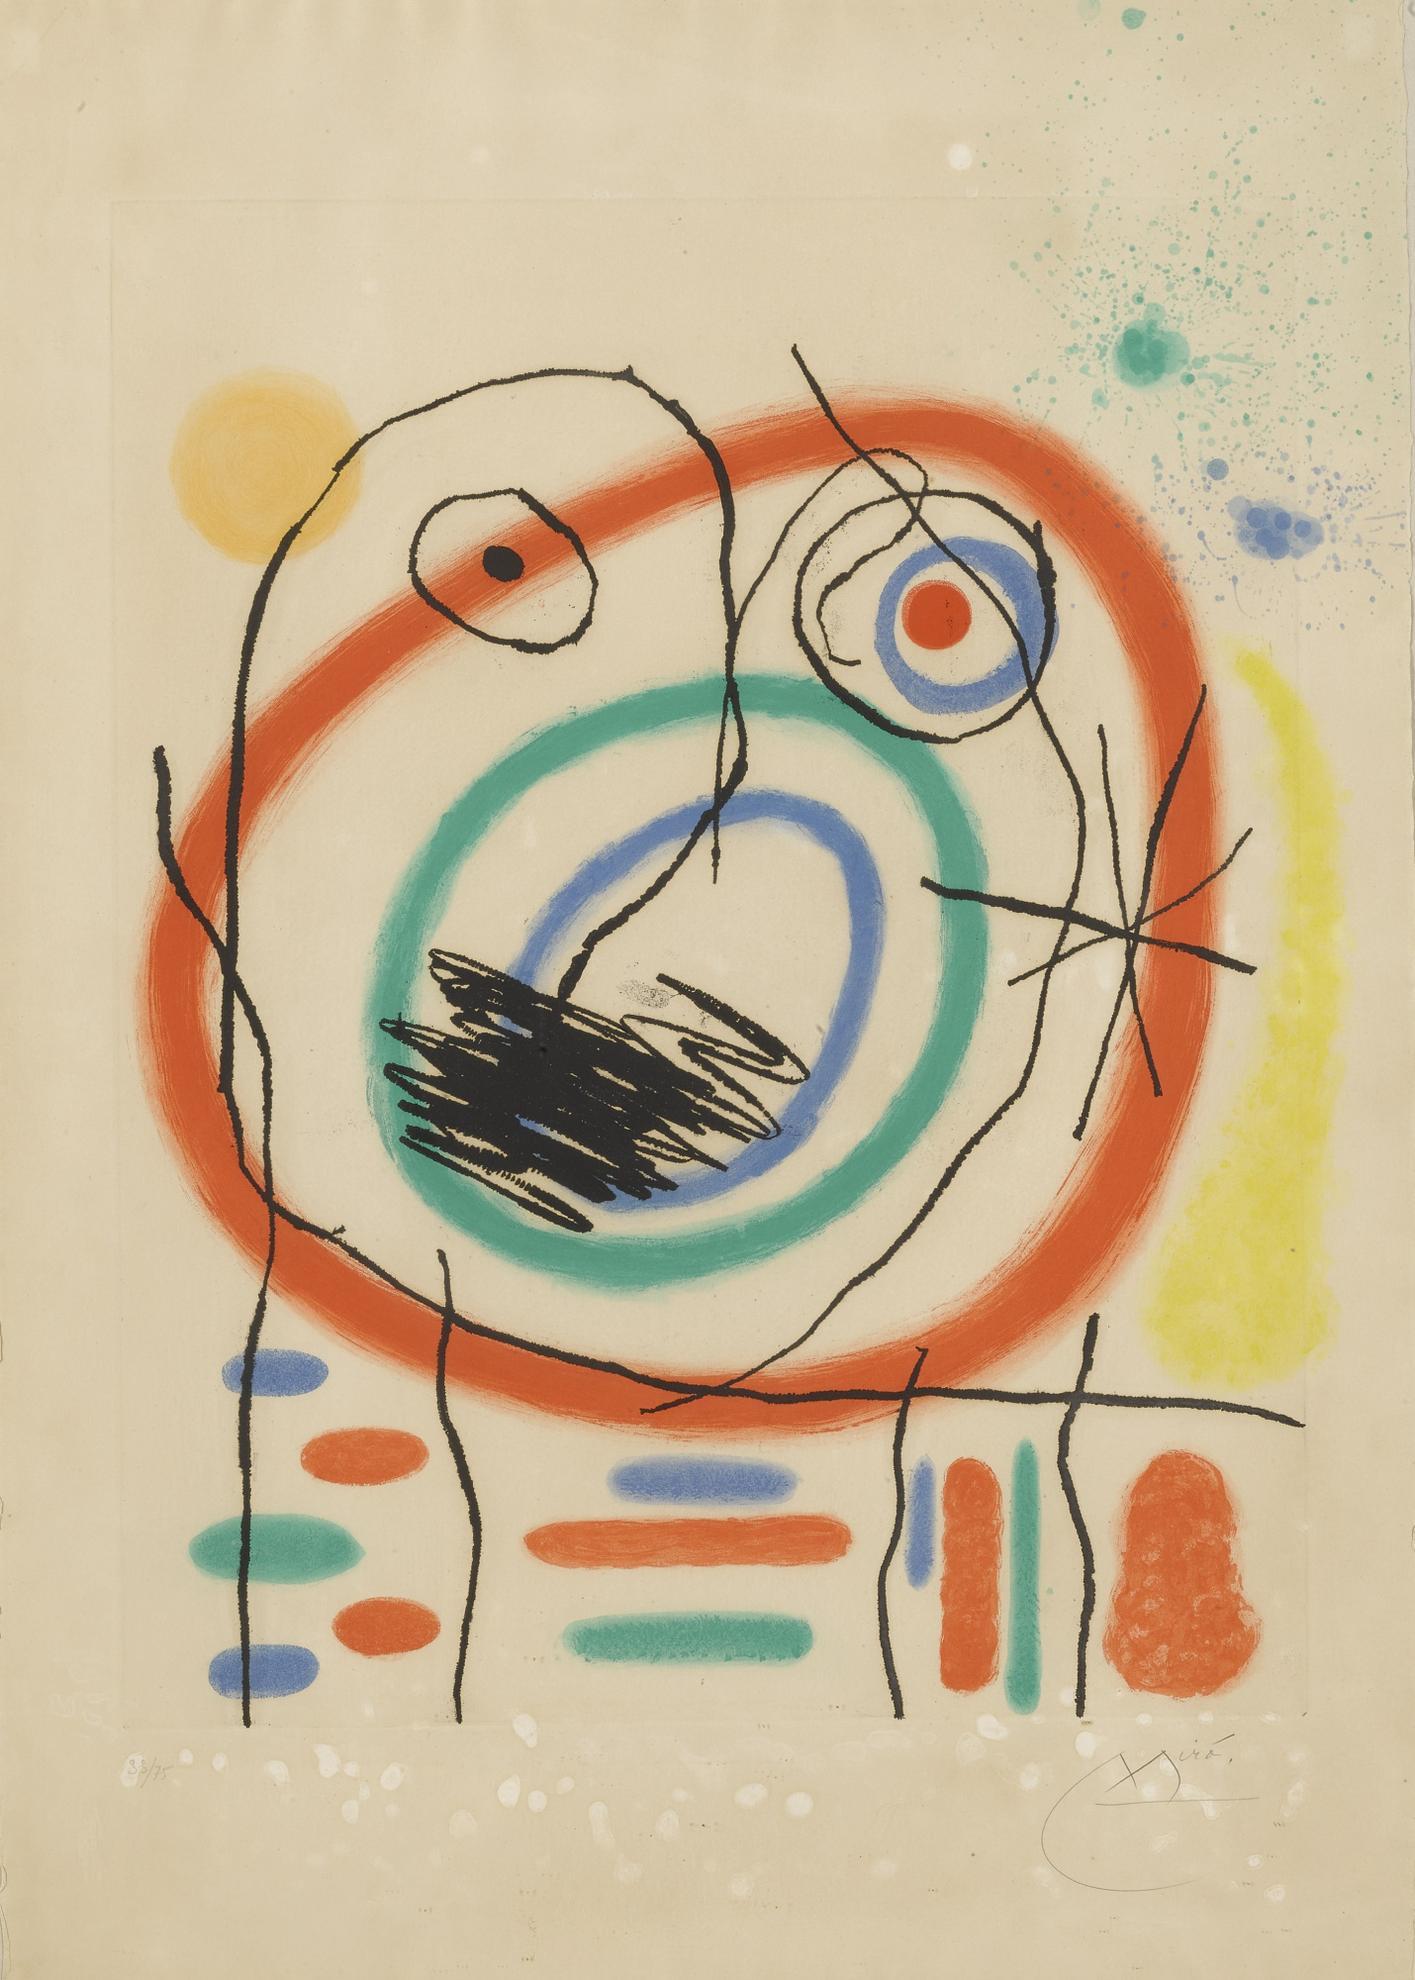 Joan Miro-Le Prophete Encercle And Serie Mallorca: Plate 29 (D. 396 & 638)-1973